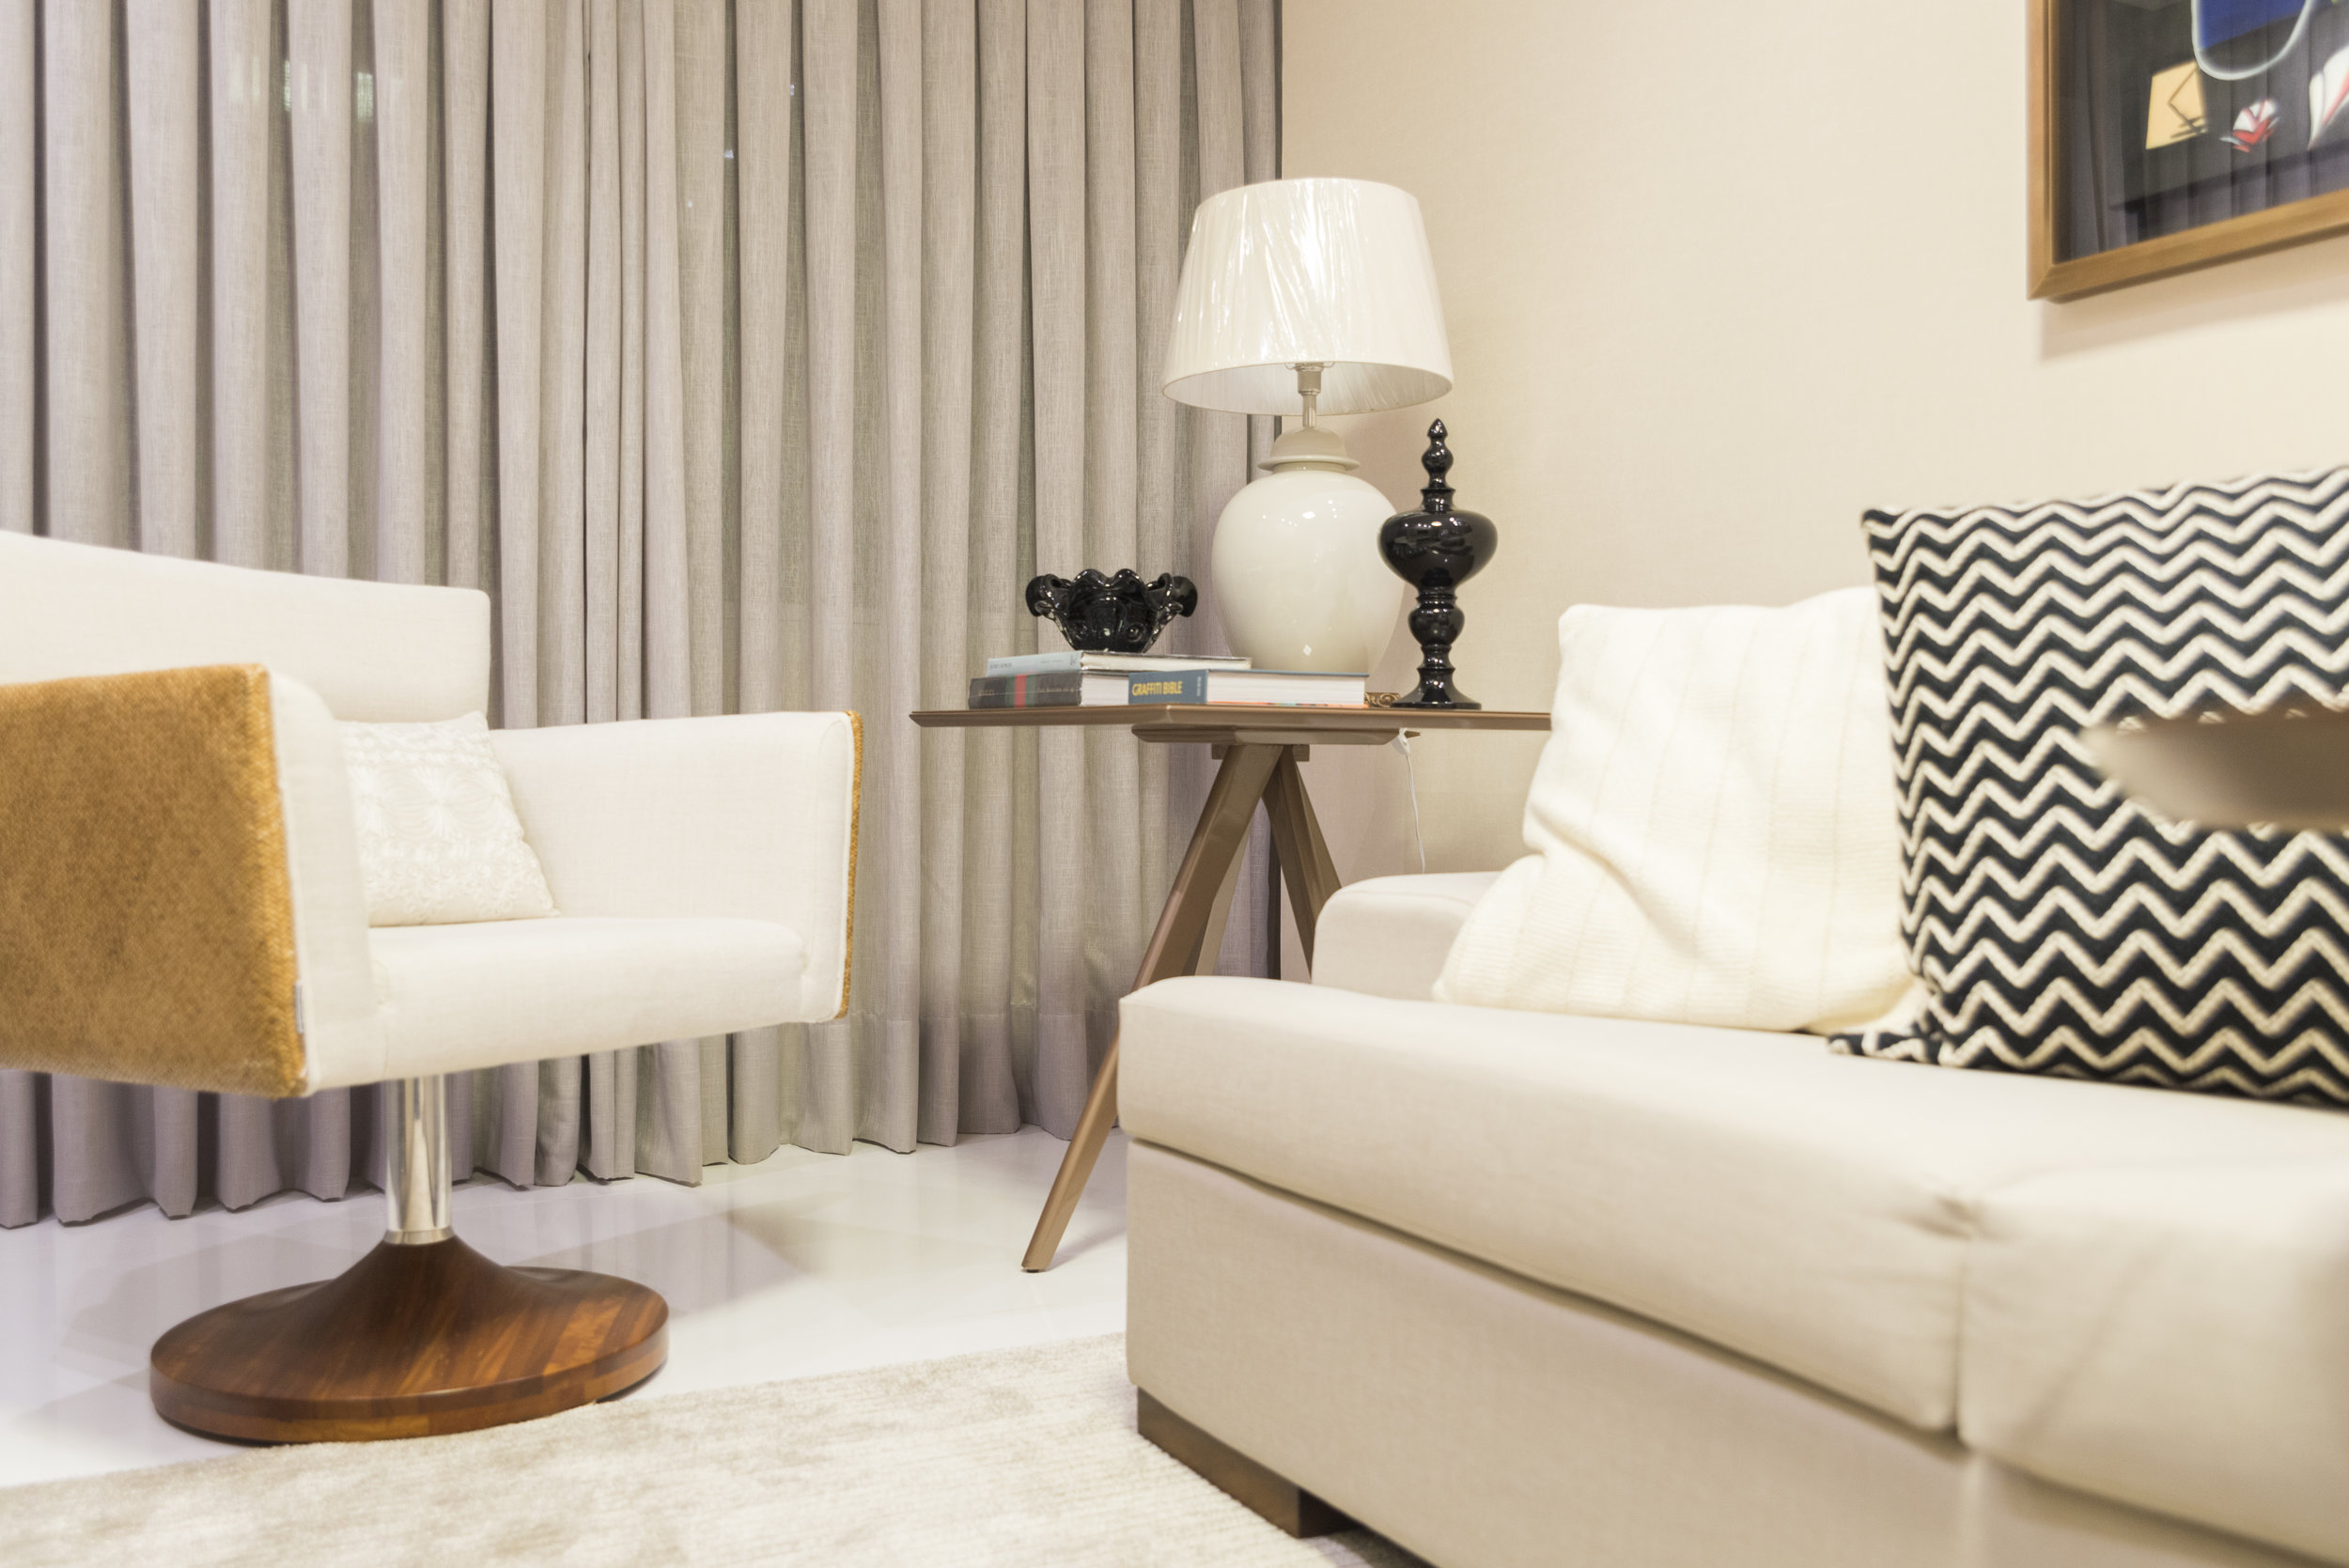 projeto-arquitetonico-robertoindira-duo-arquitetura-apartamentos-estar-015.jpg